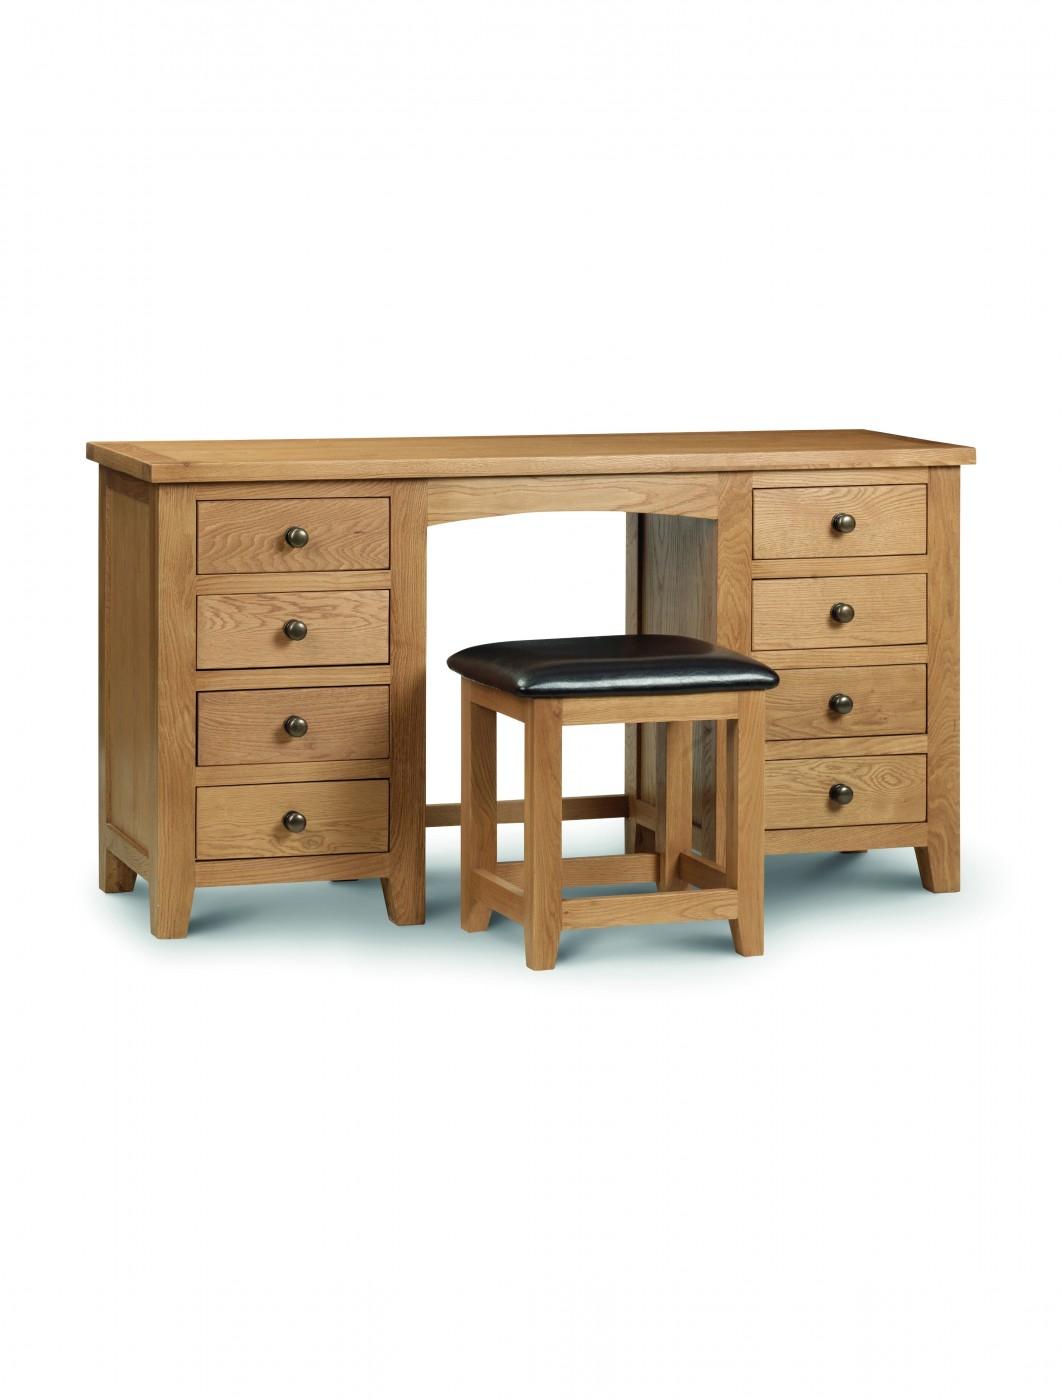 Marlborough Twin Pedestal Dressing Table Mar206 121 Office Furniture